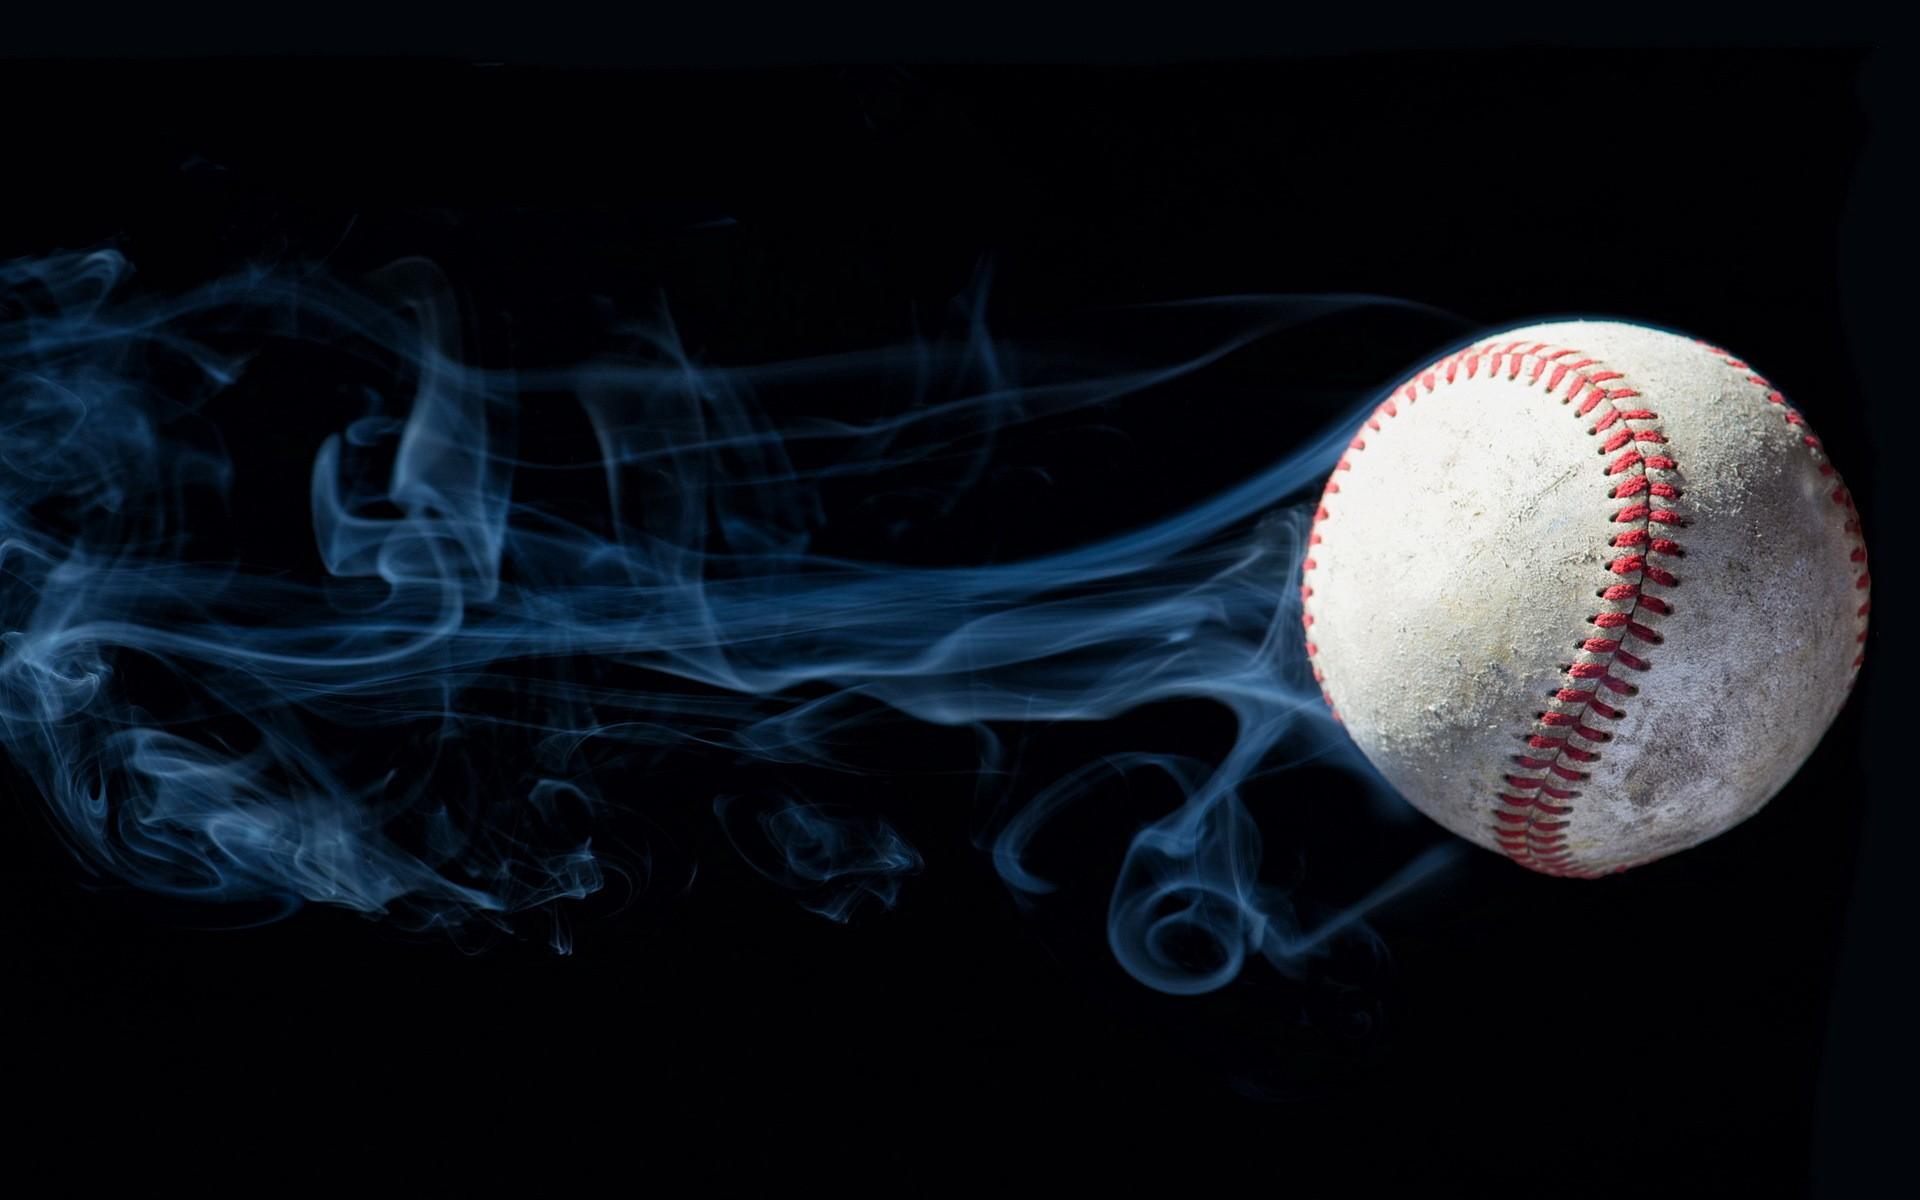 Cool Baseball Wallpaper 9118 1920x1200